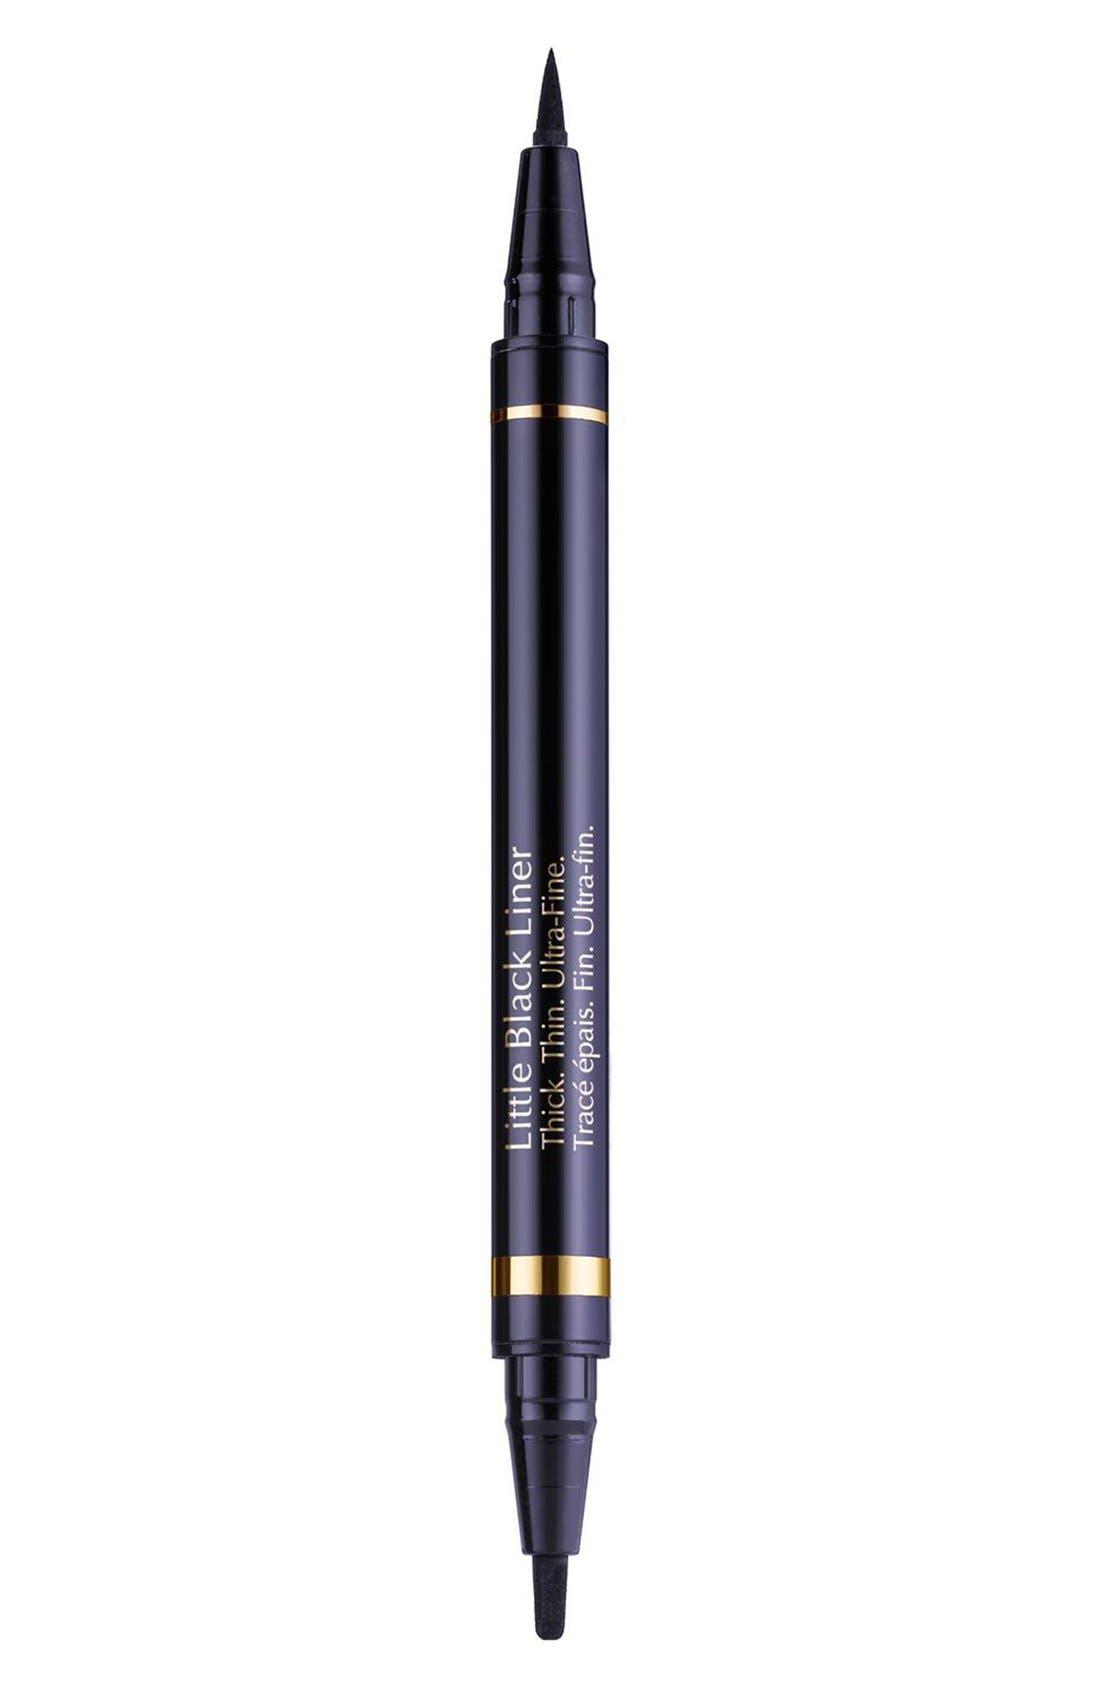 Little Black Liner Liquid Eyeliner